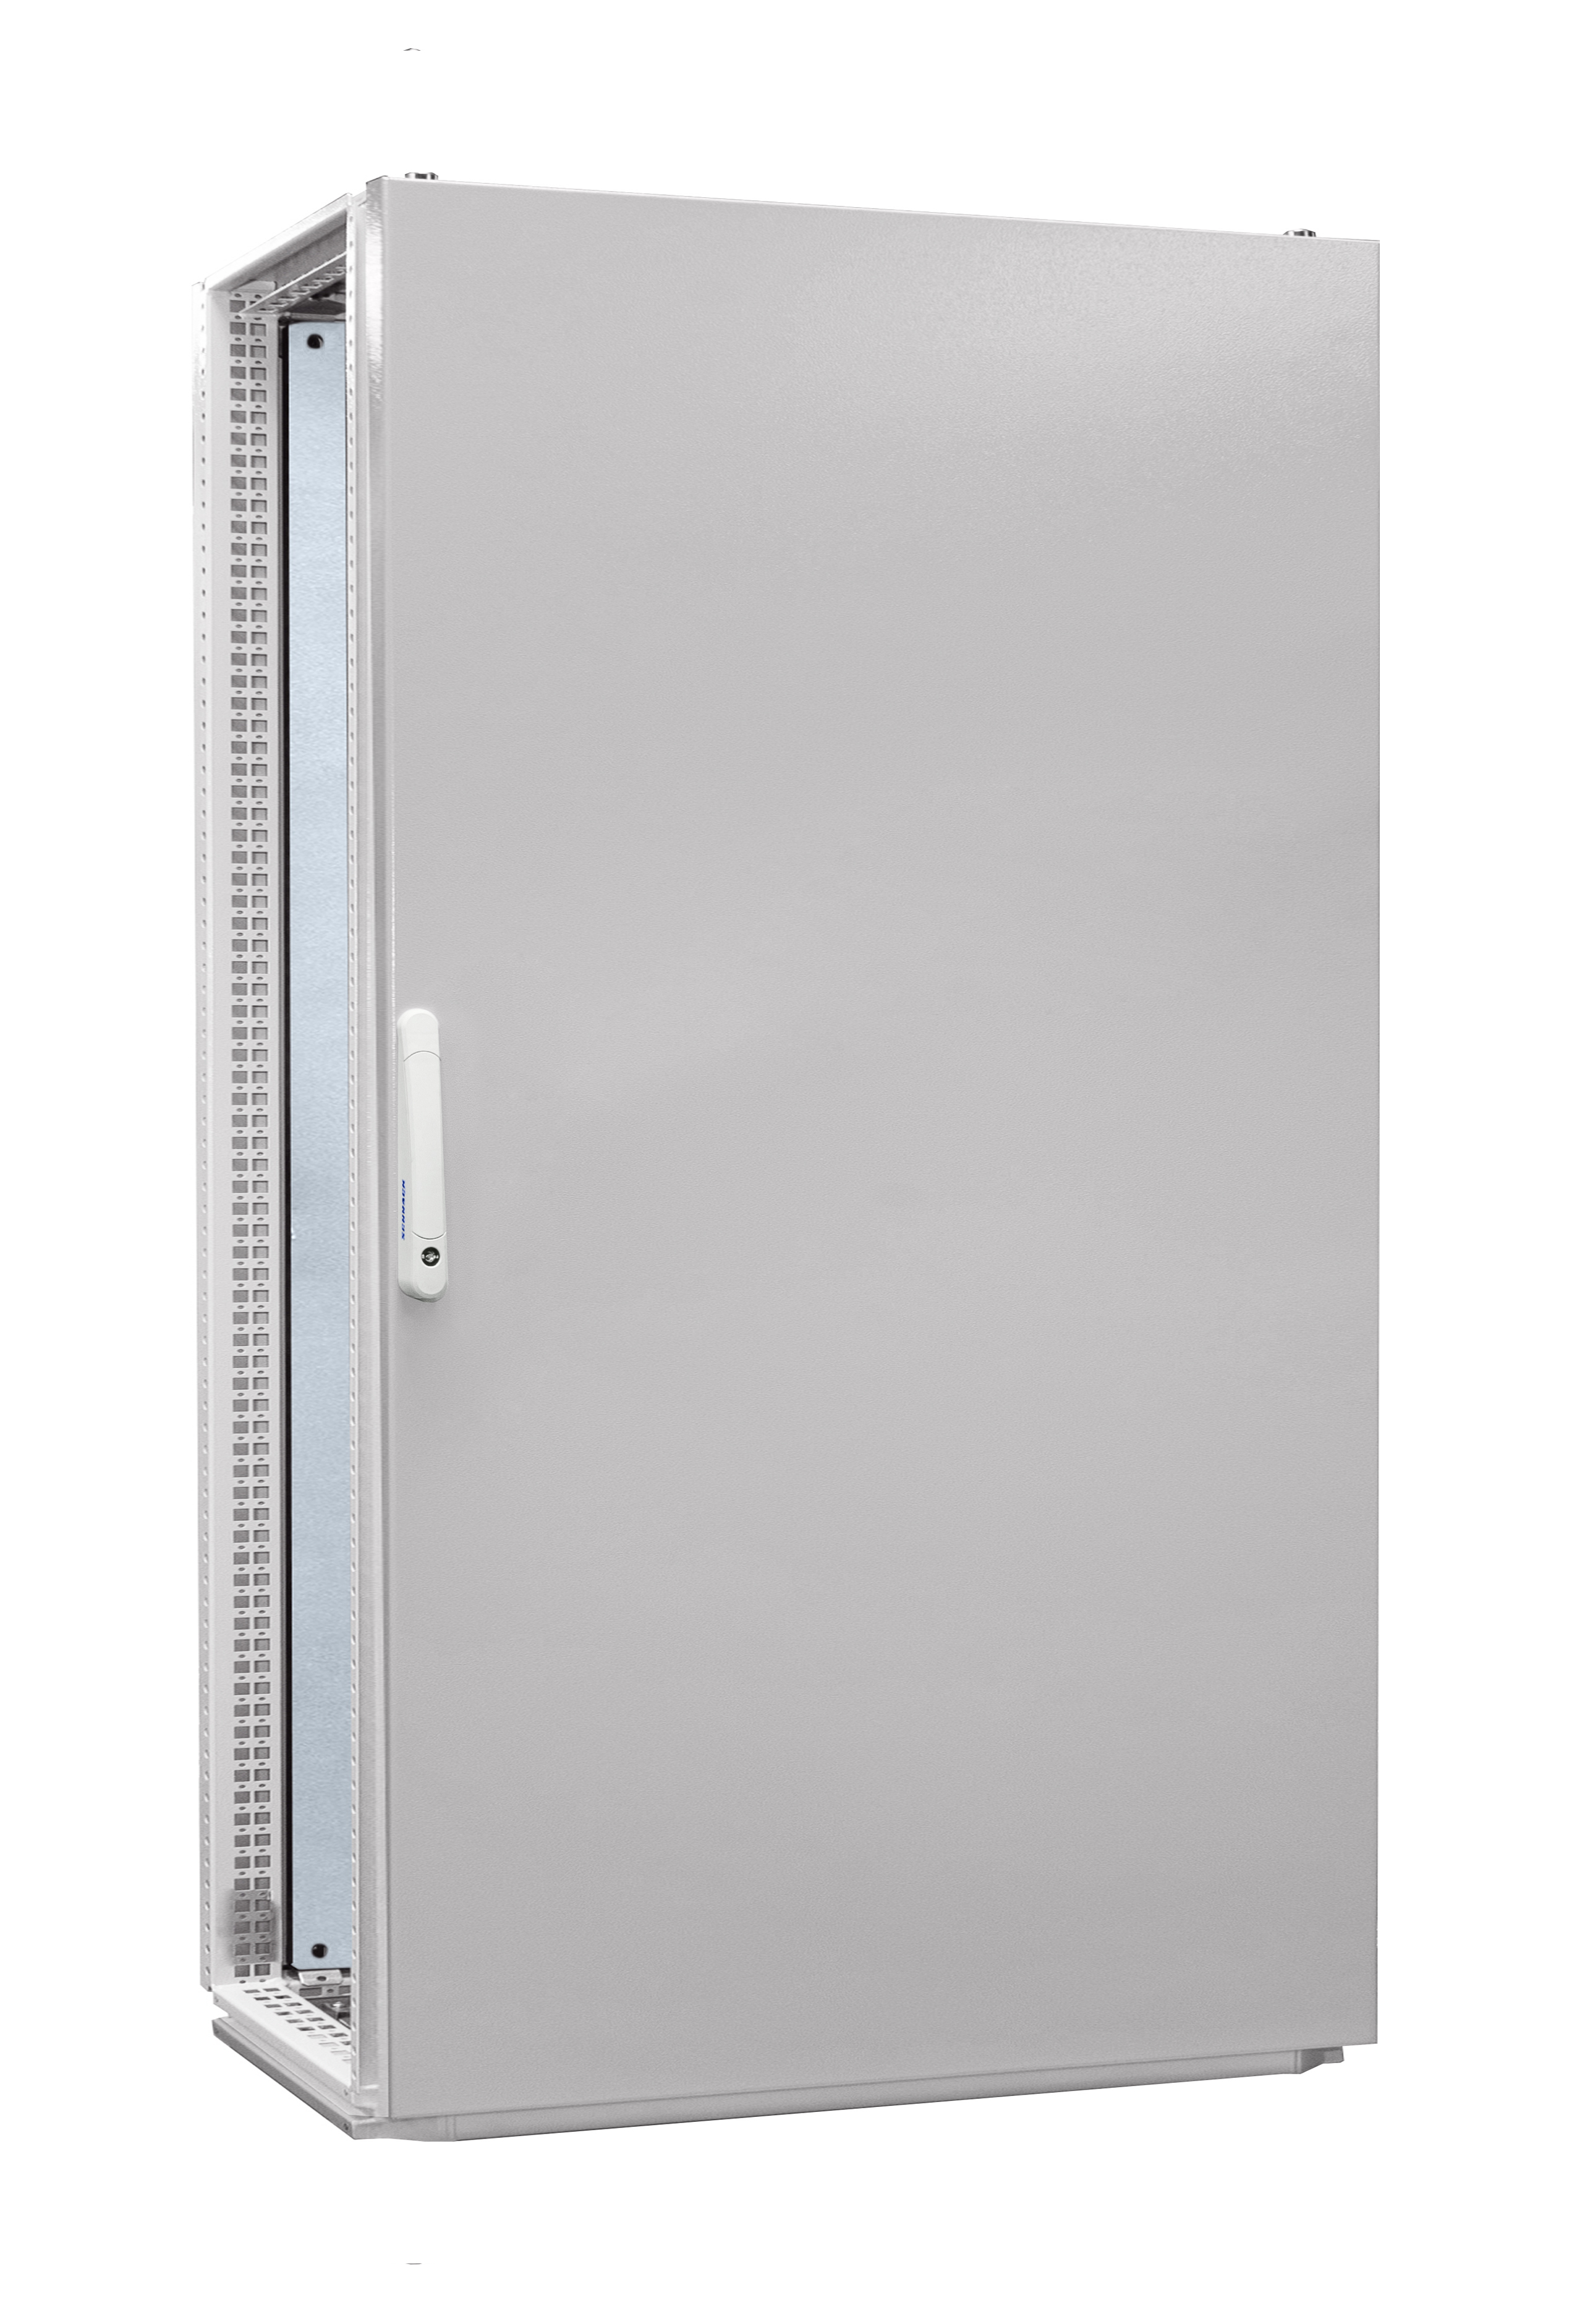 1 Stk Anreihschrank 1-Tür IP55 H=1800 B=1000 T=600mm Stahlblech AC181060--